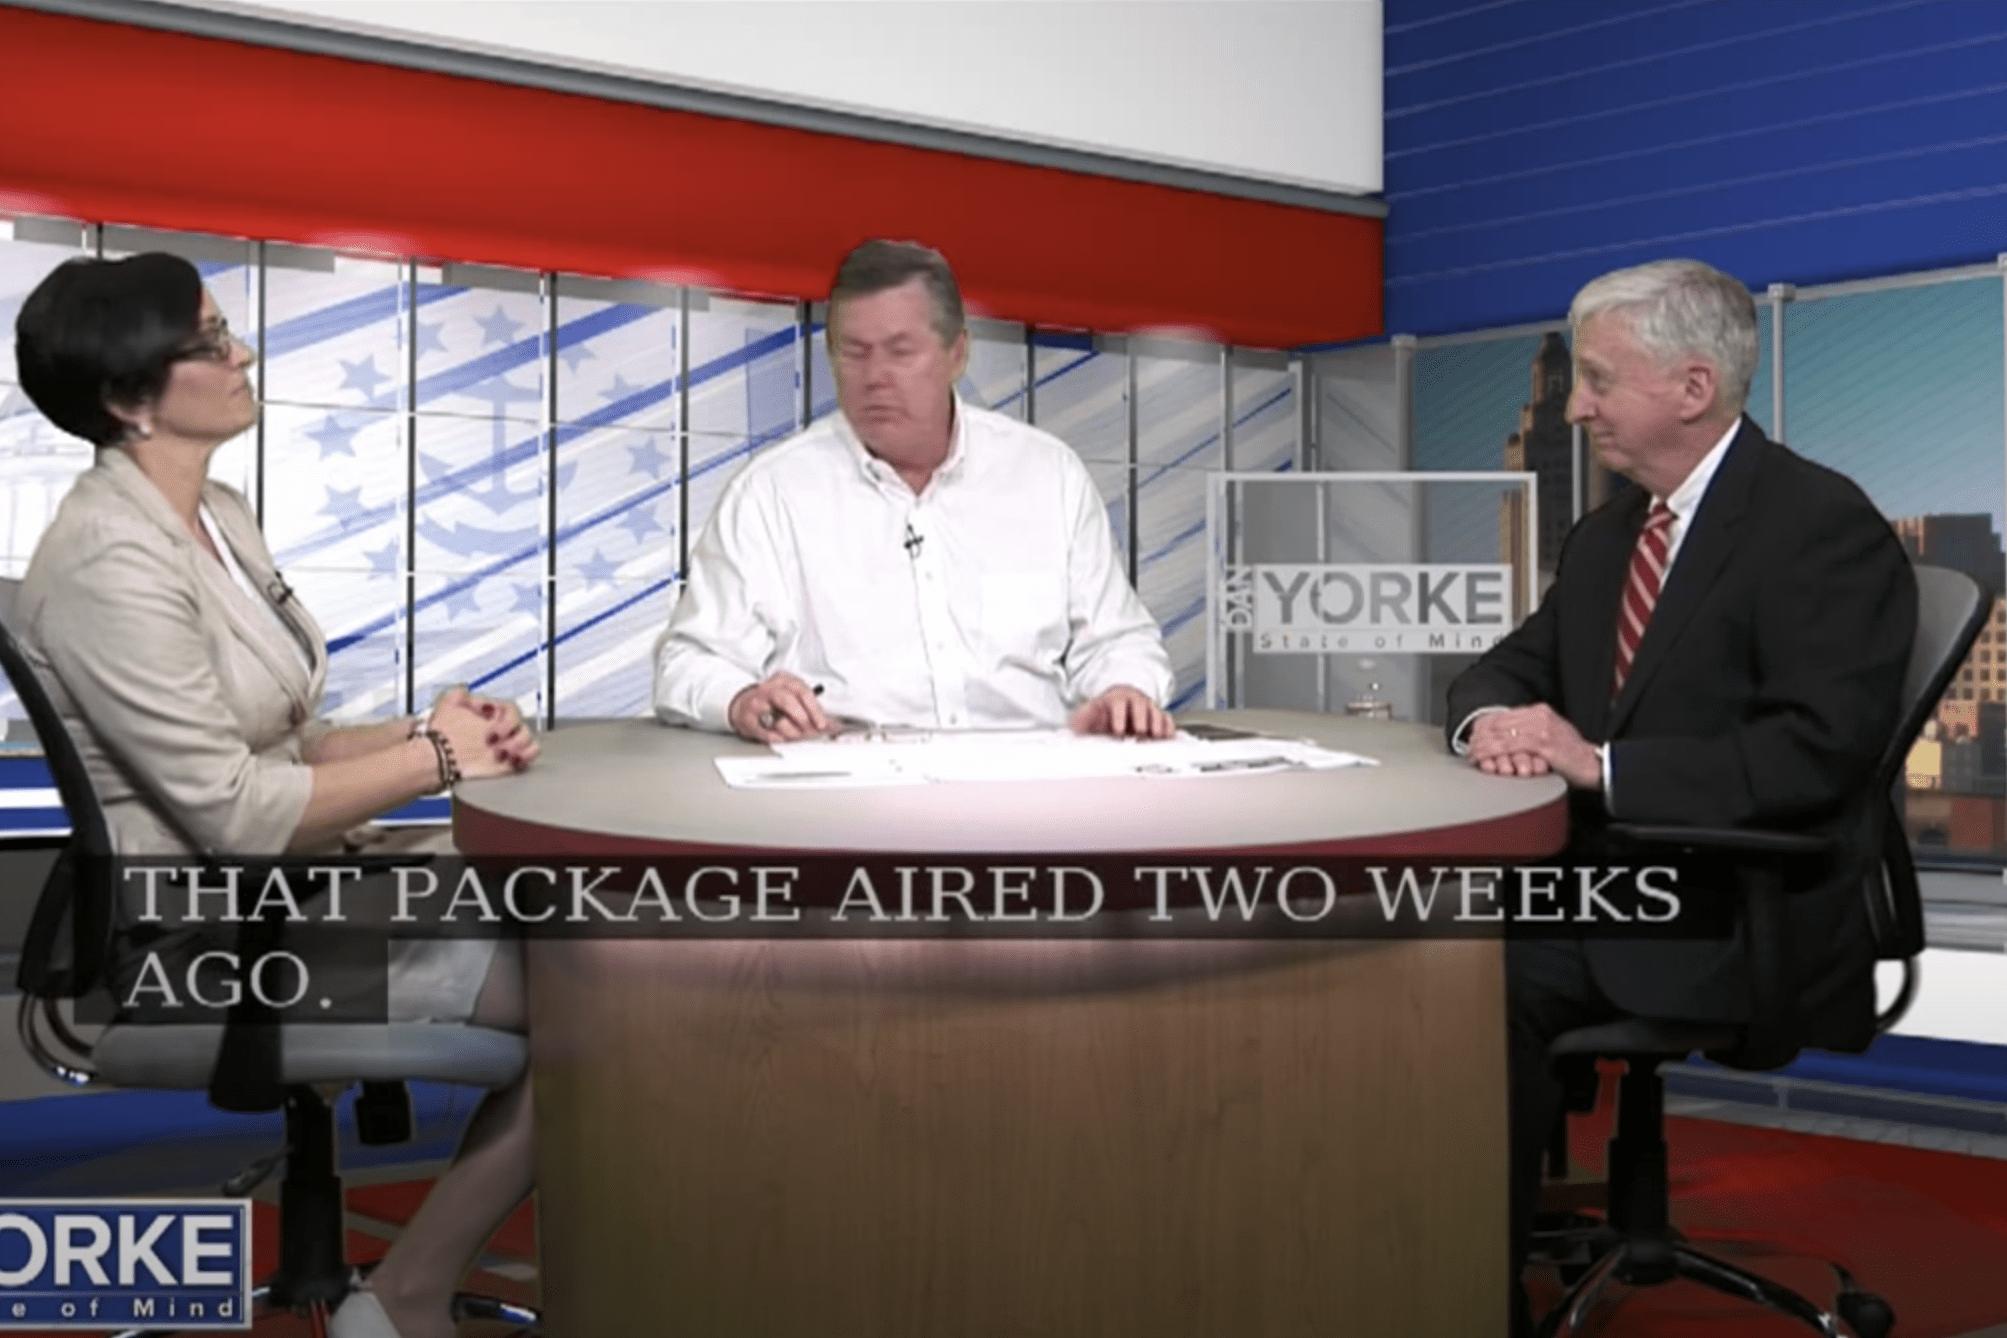 Jina Petrarca speaking to Dan Yorke at his desk on the Dan Yorke television show